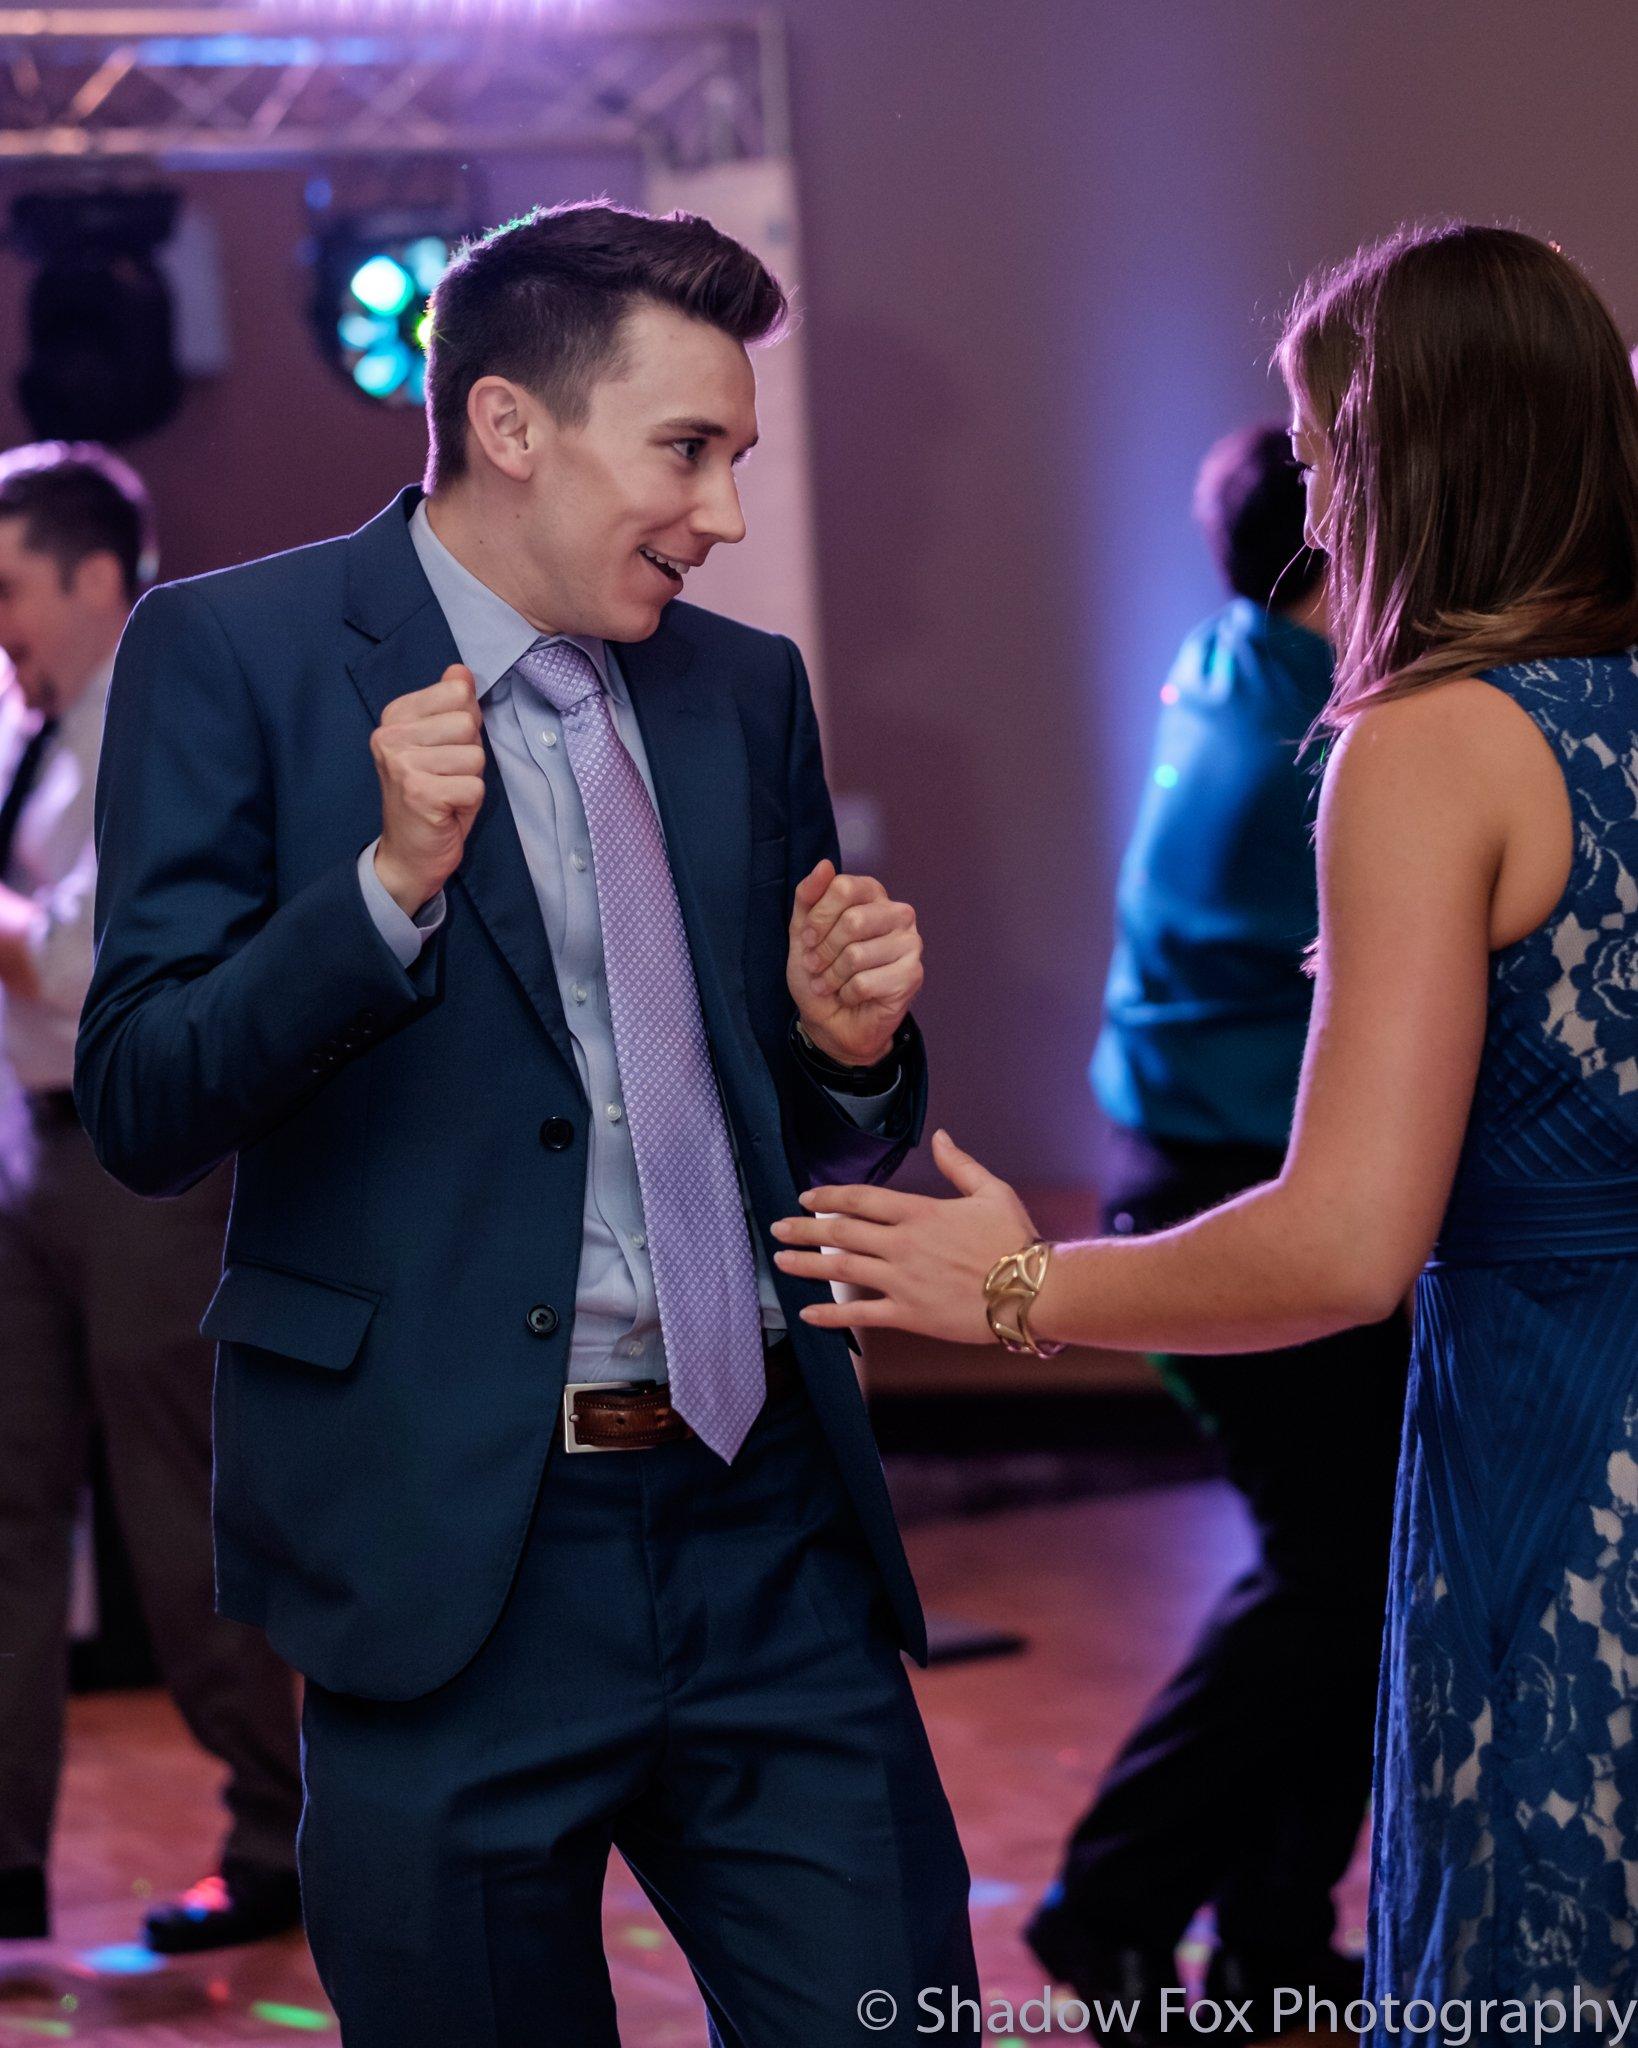 Photo of dancing at wedding reception